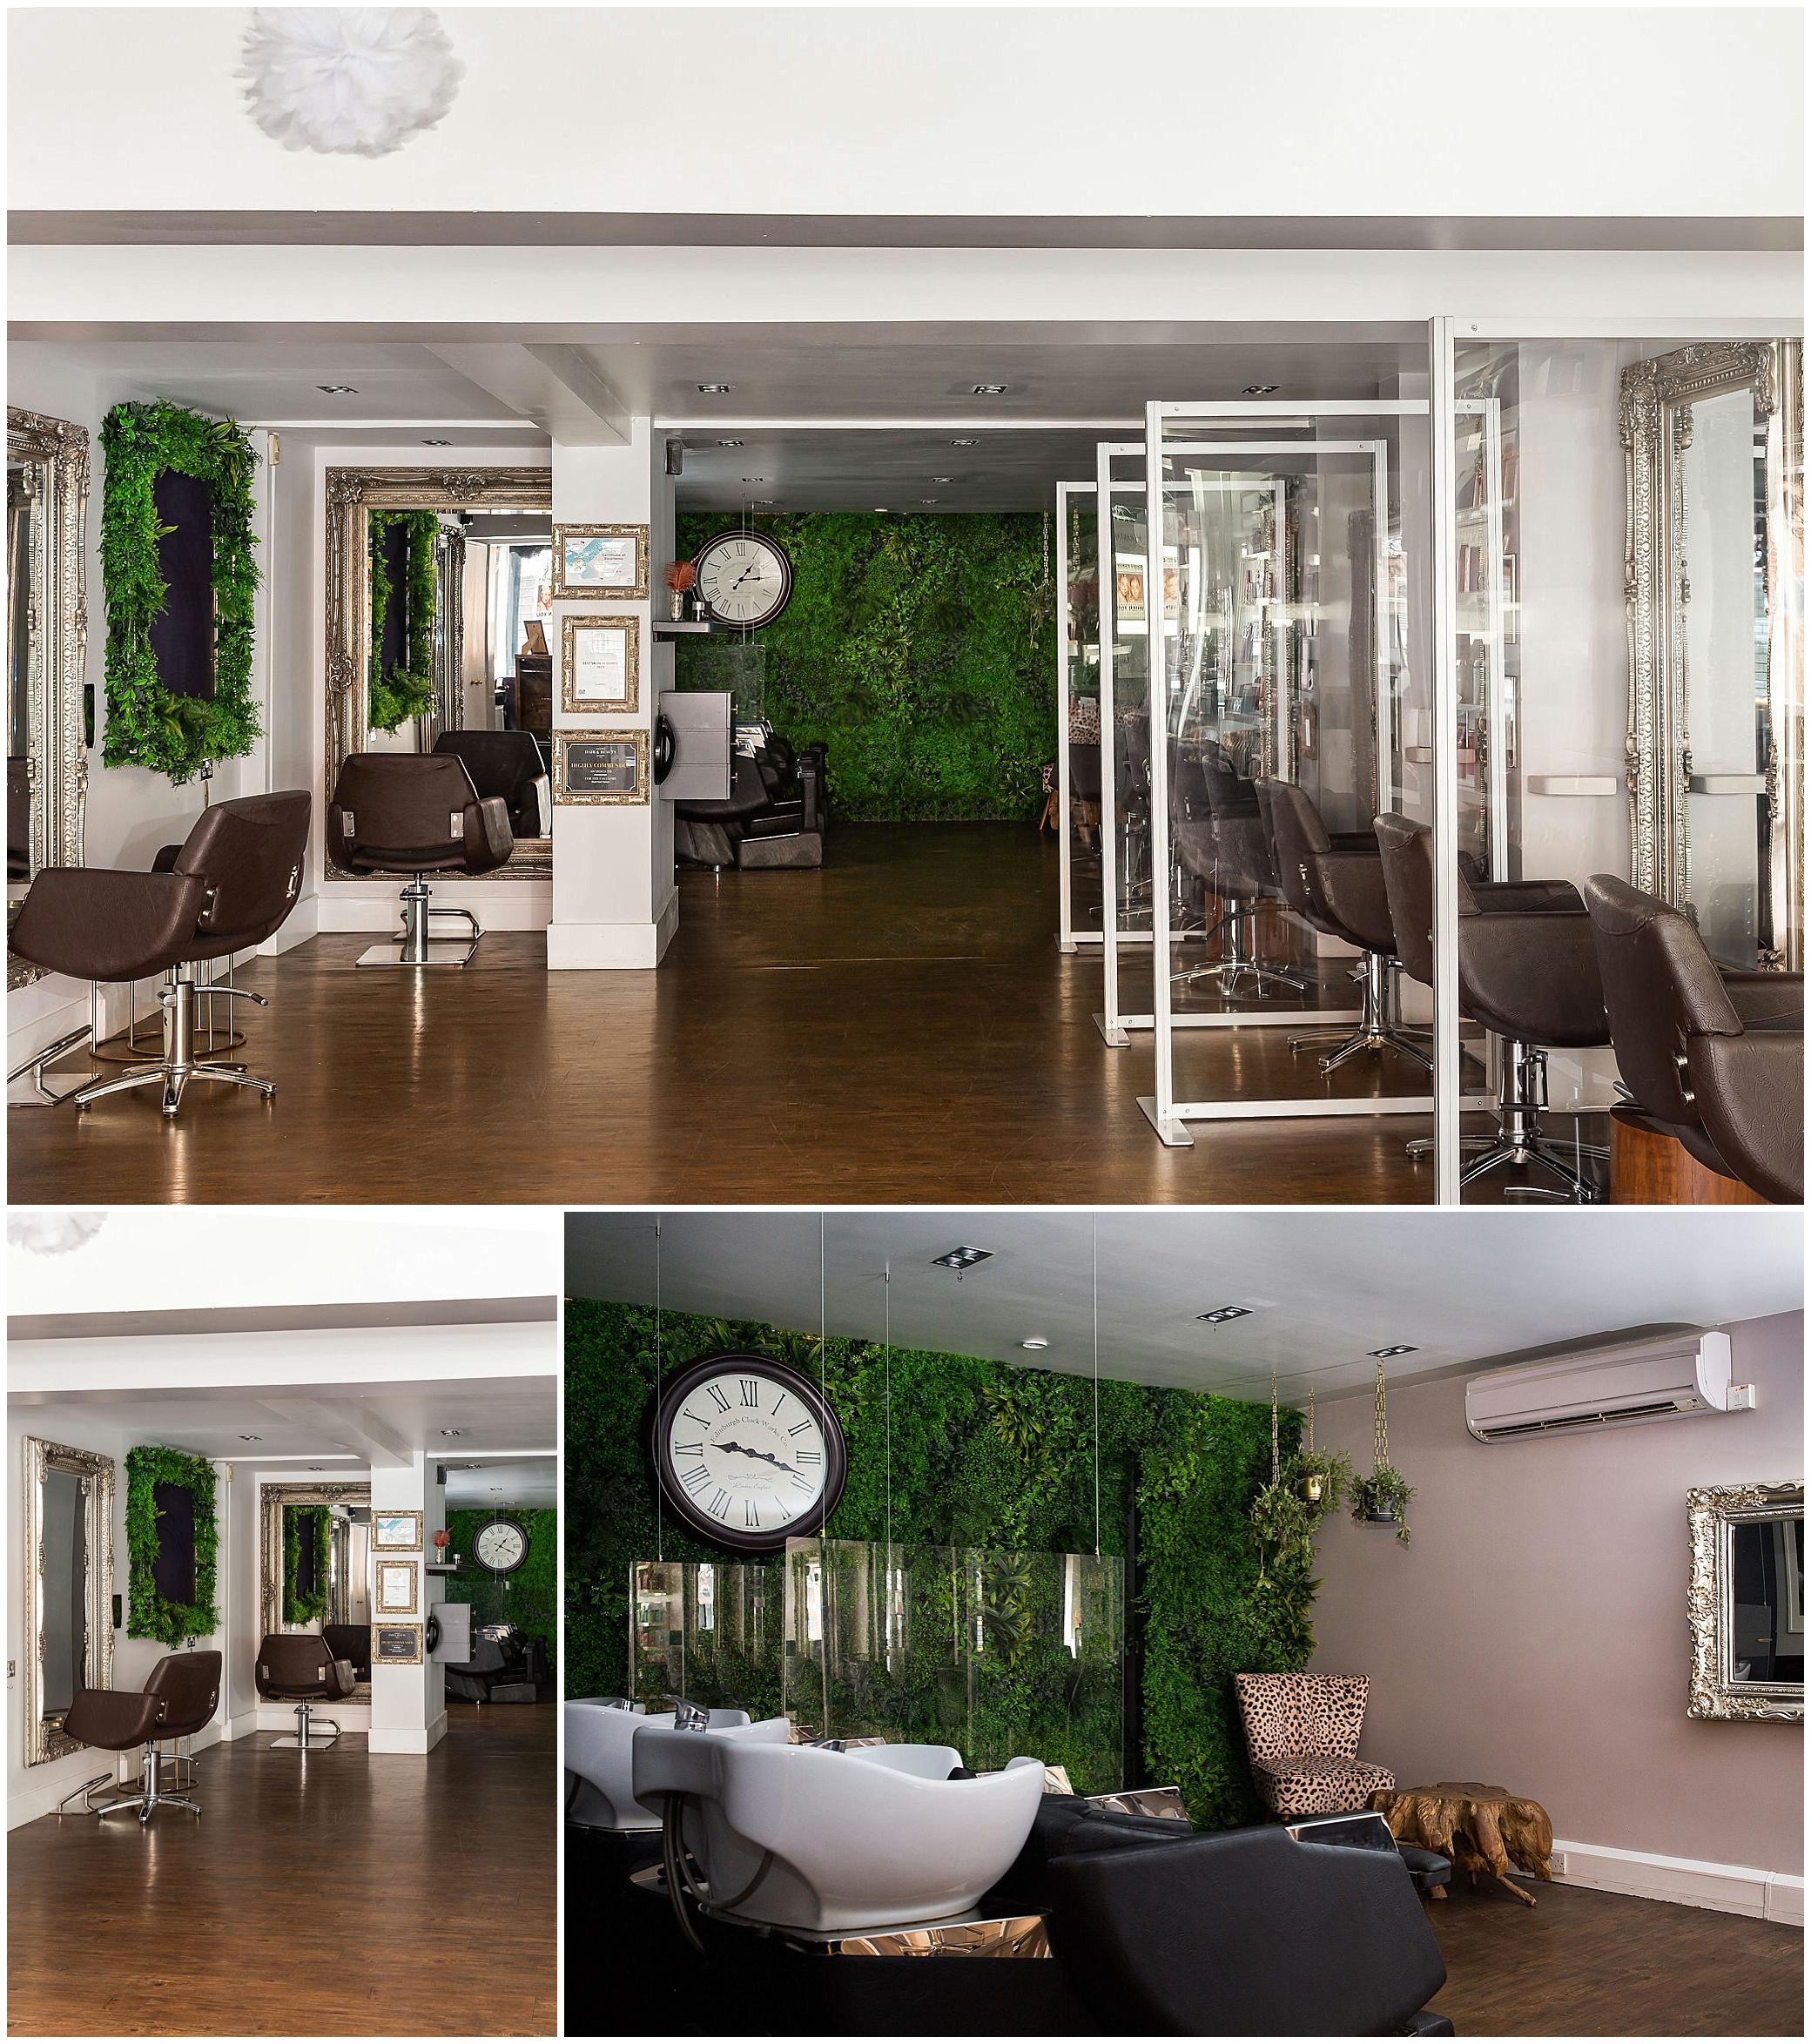 hair salon interior photography